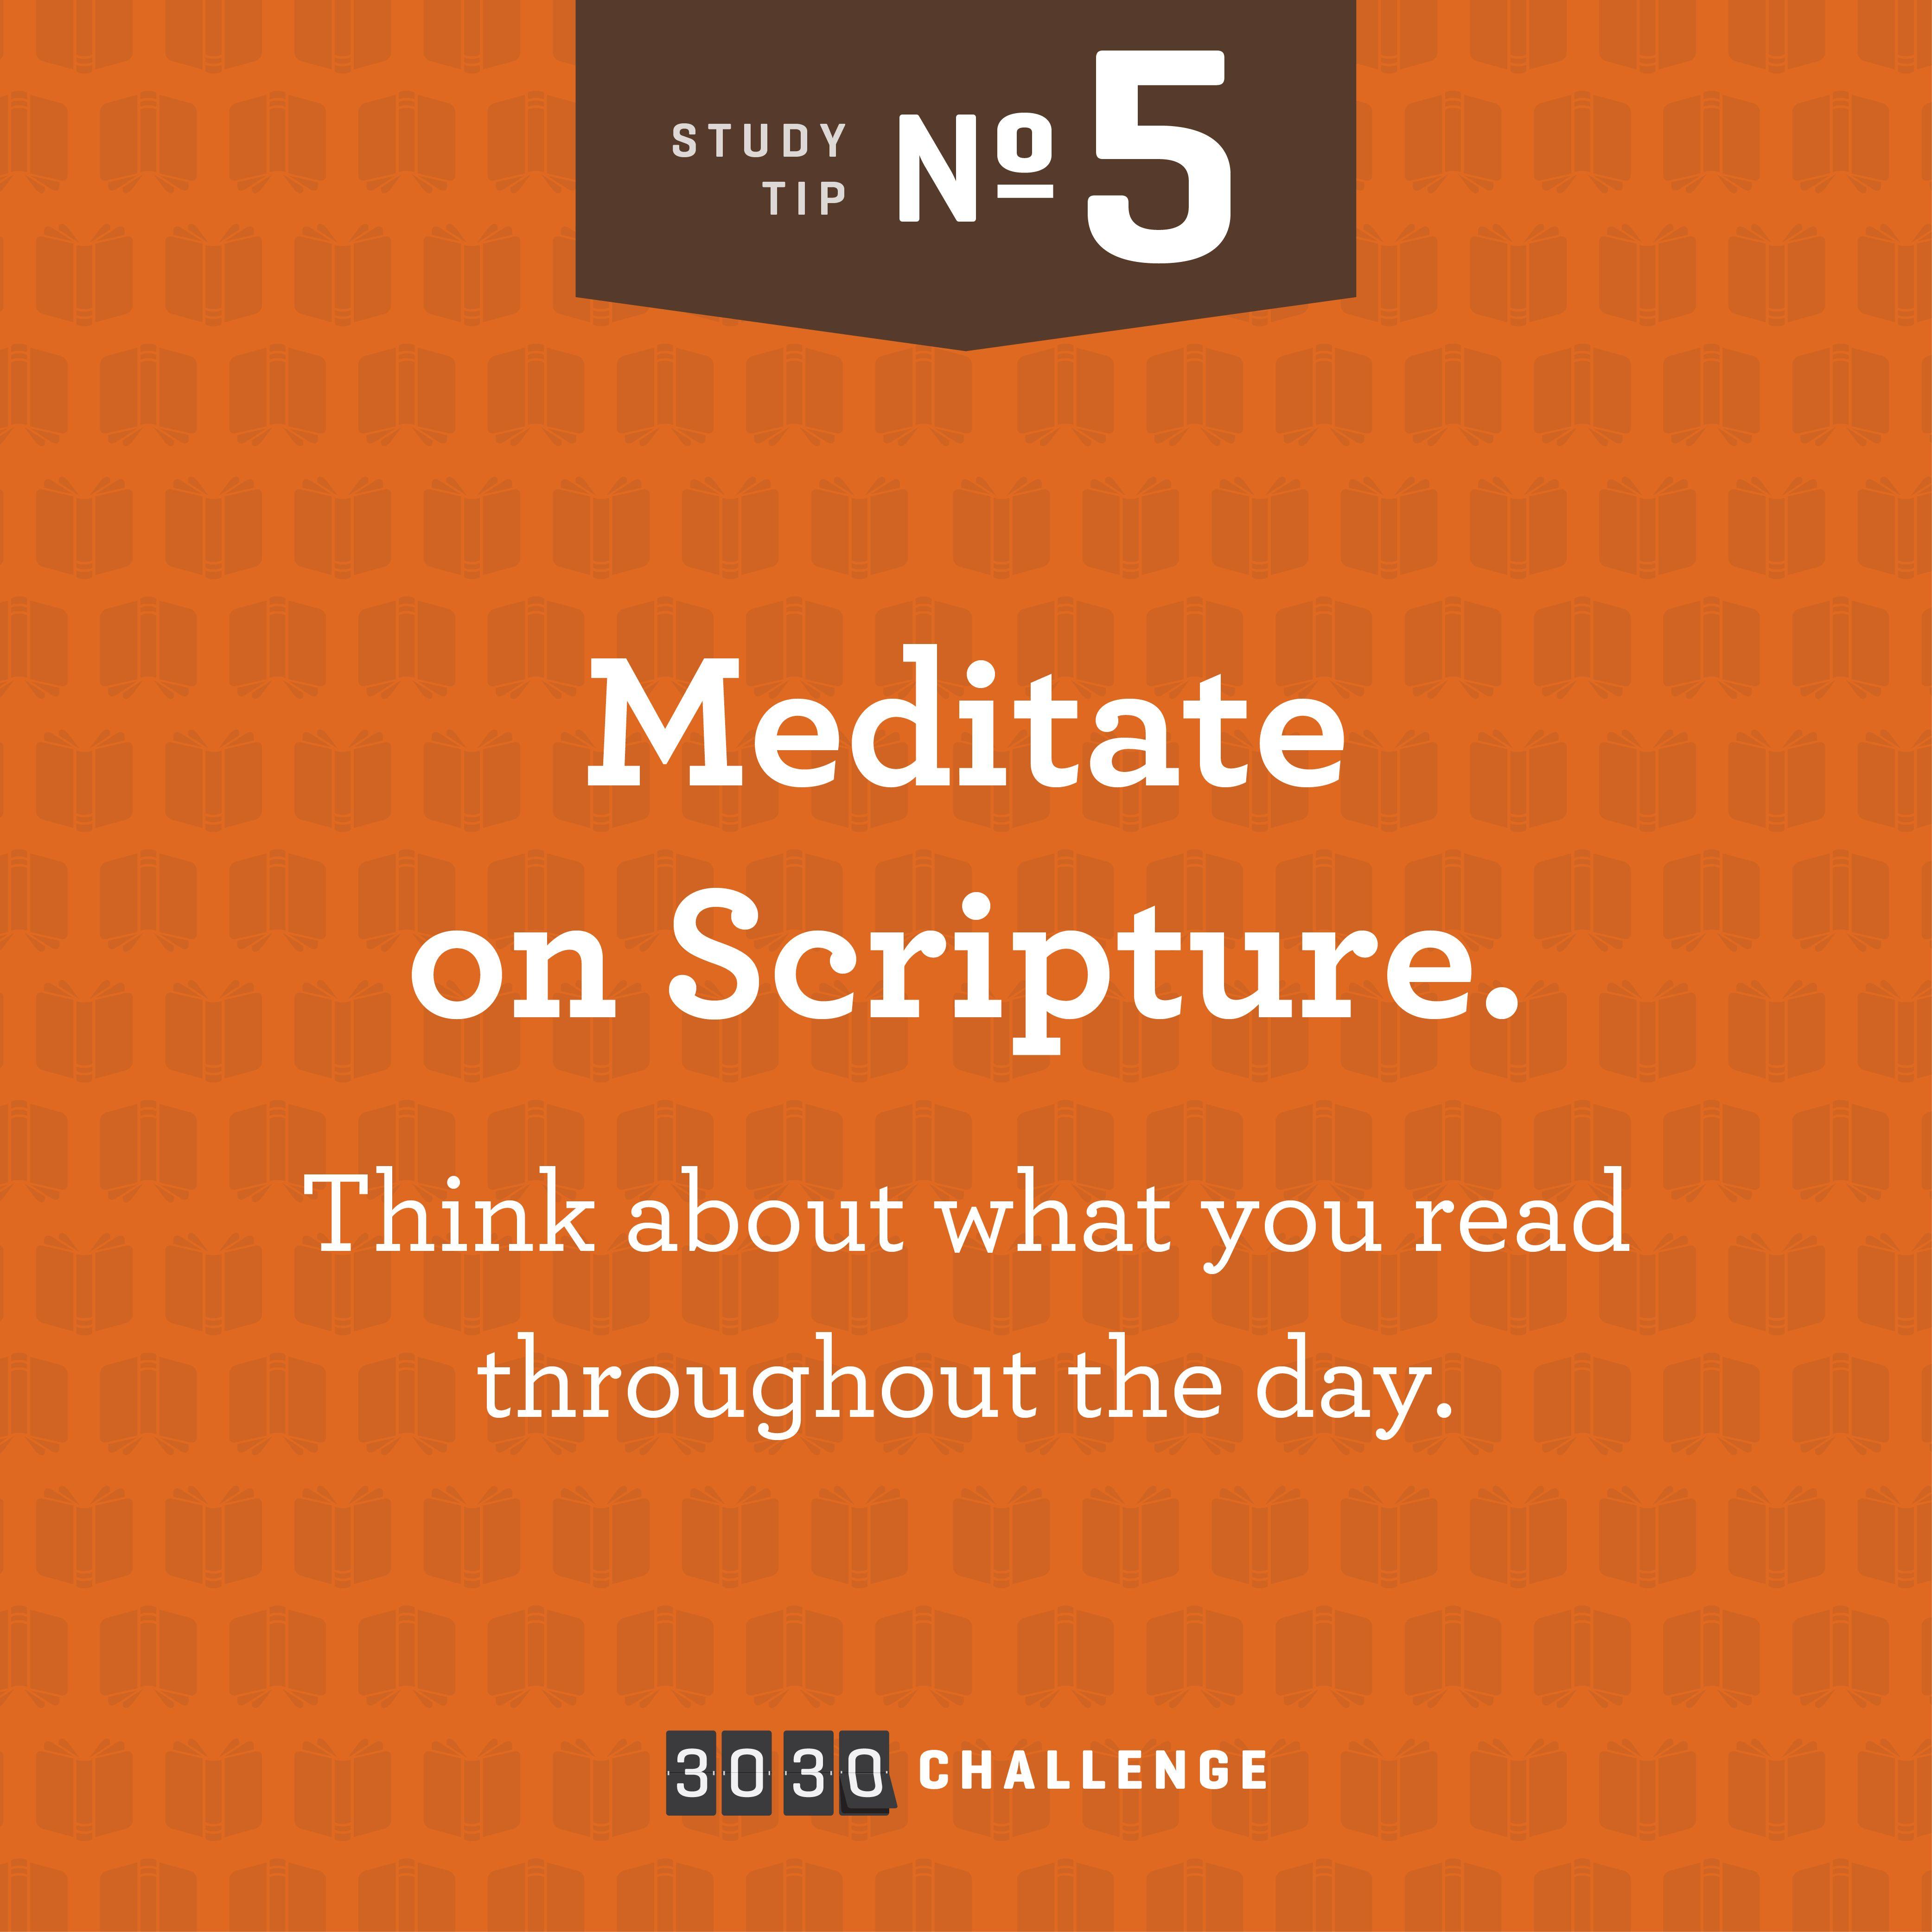 Bible Study Tip 5 Bible study tips, Read bible, Joyce